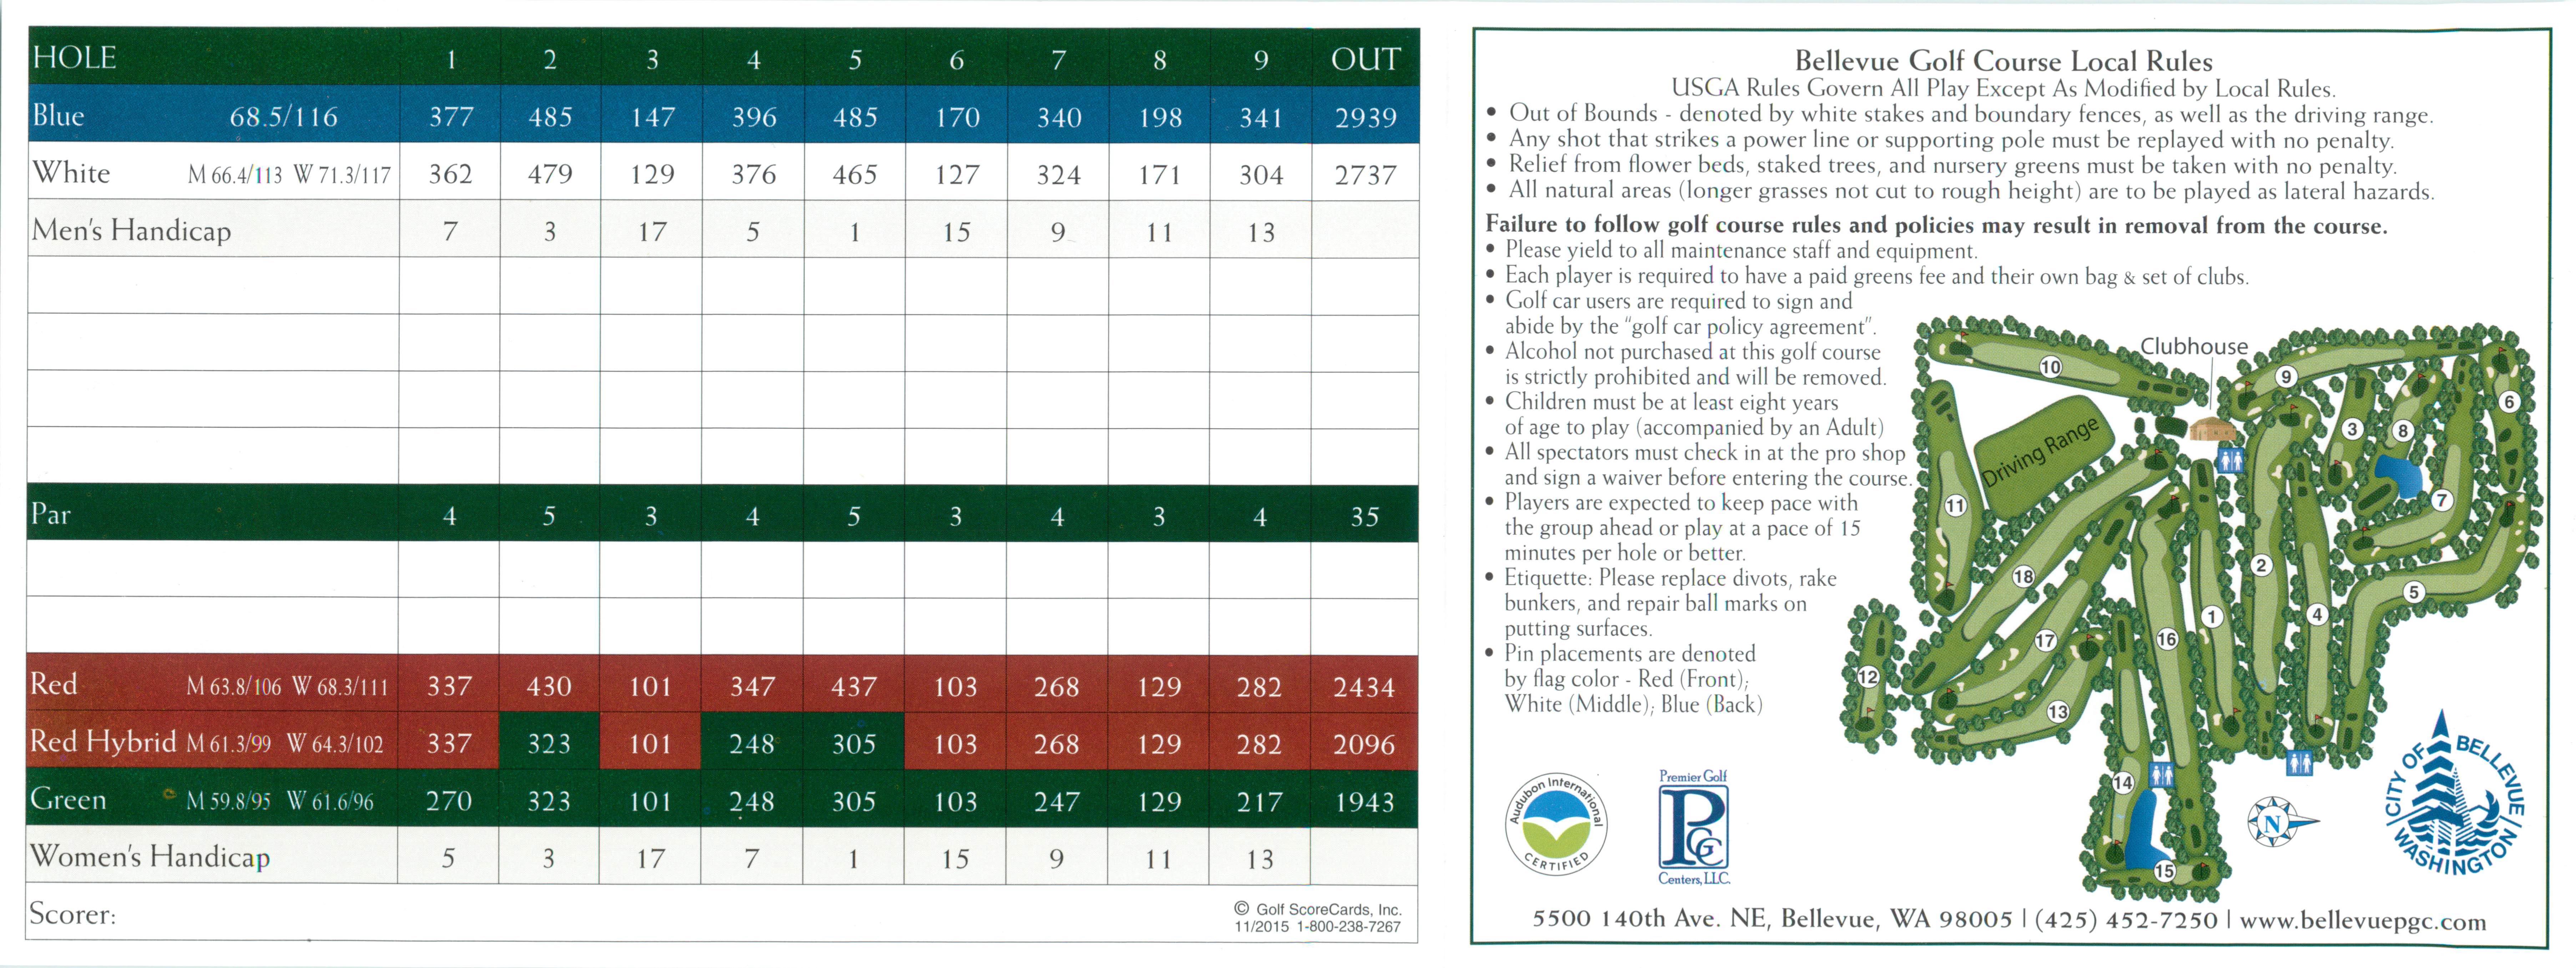 2017 Bellevue Scorecard